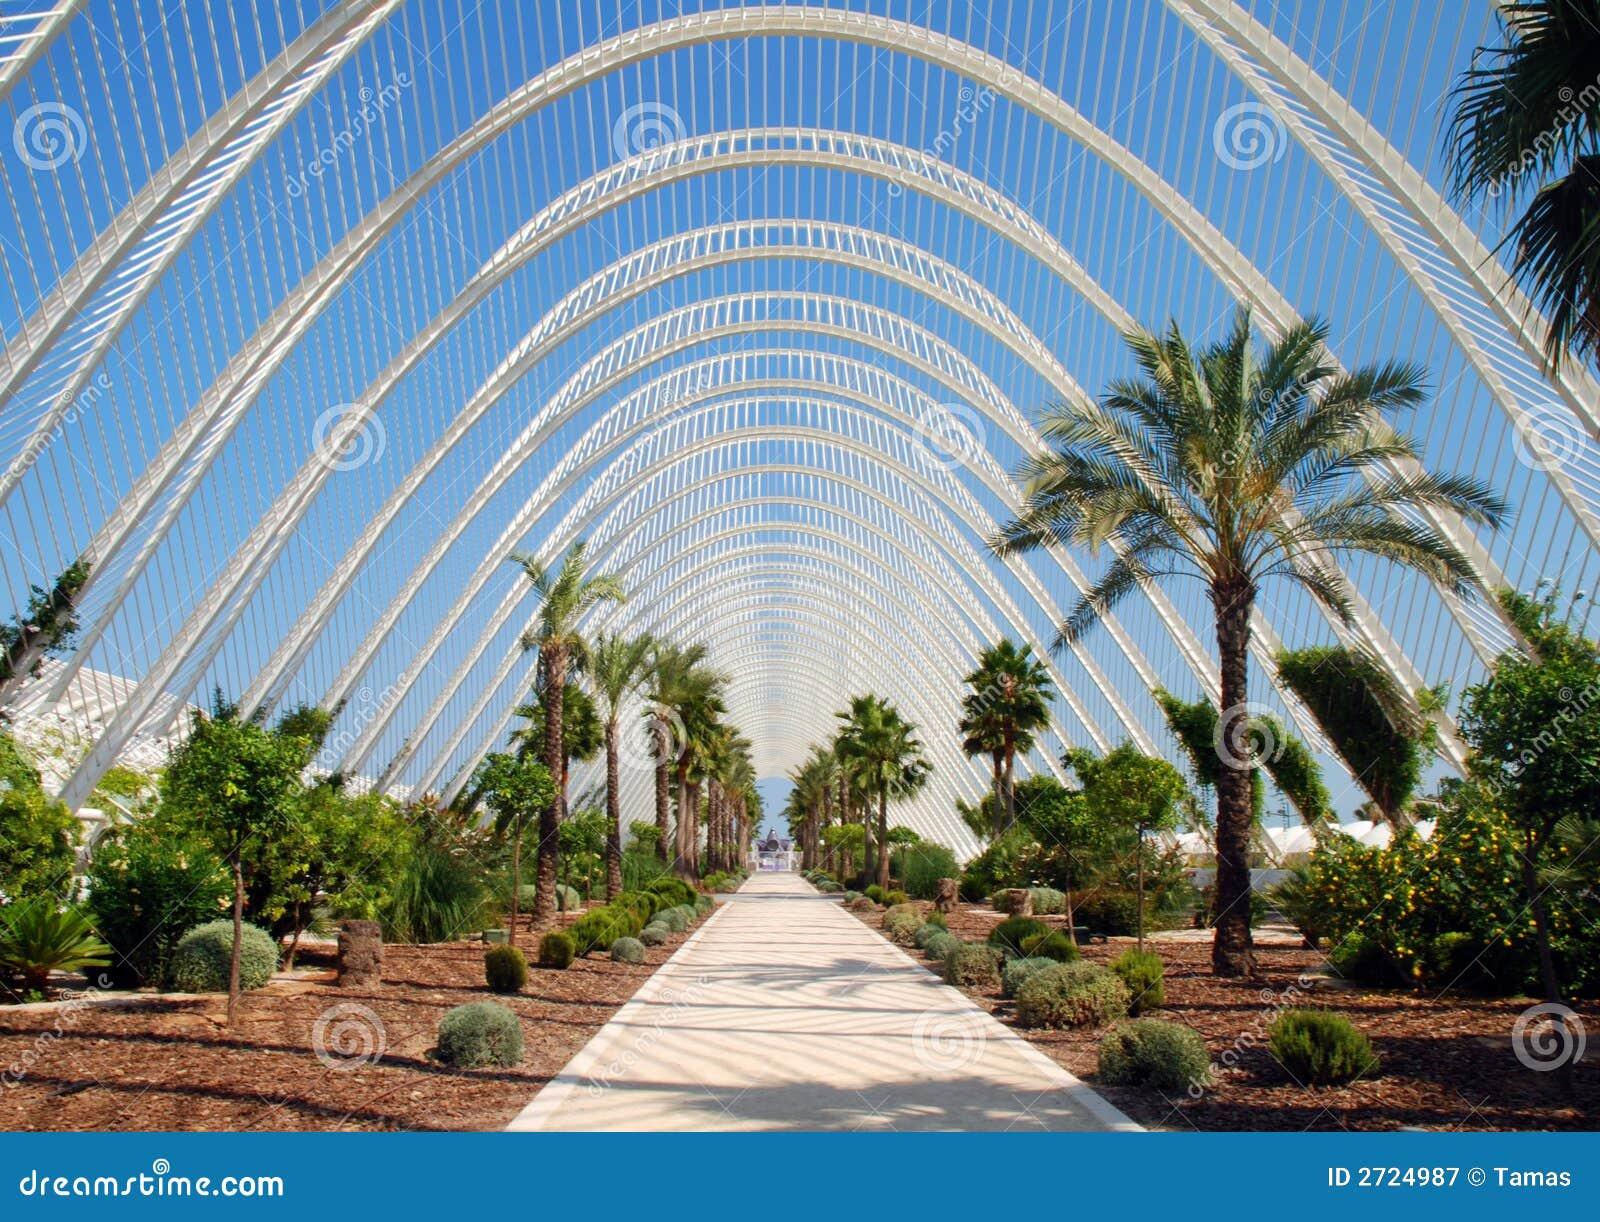 imagens de jardim tropicalBeautiful Tropical Garden